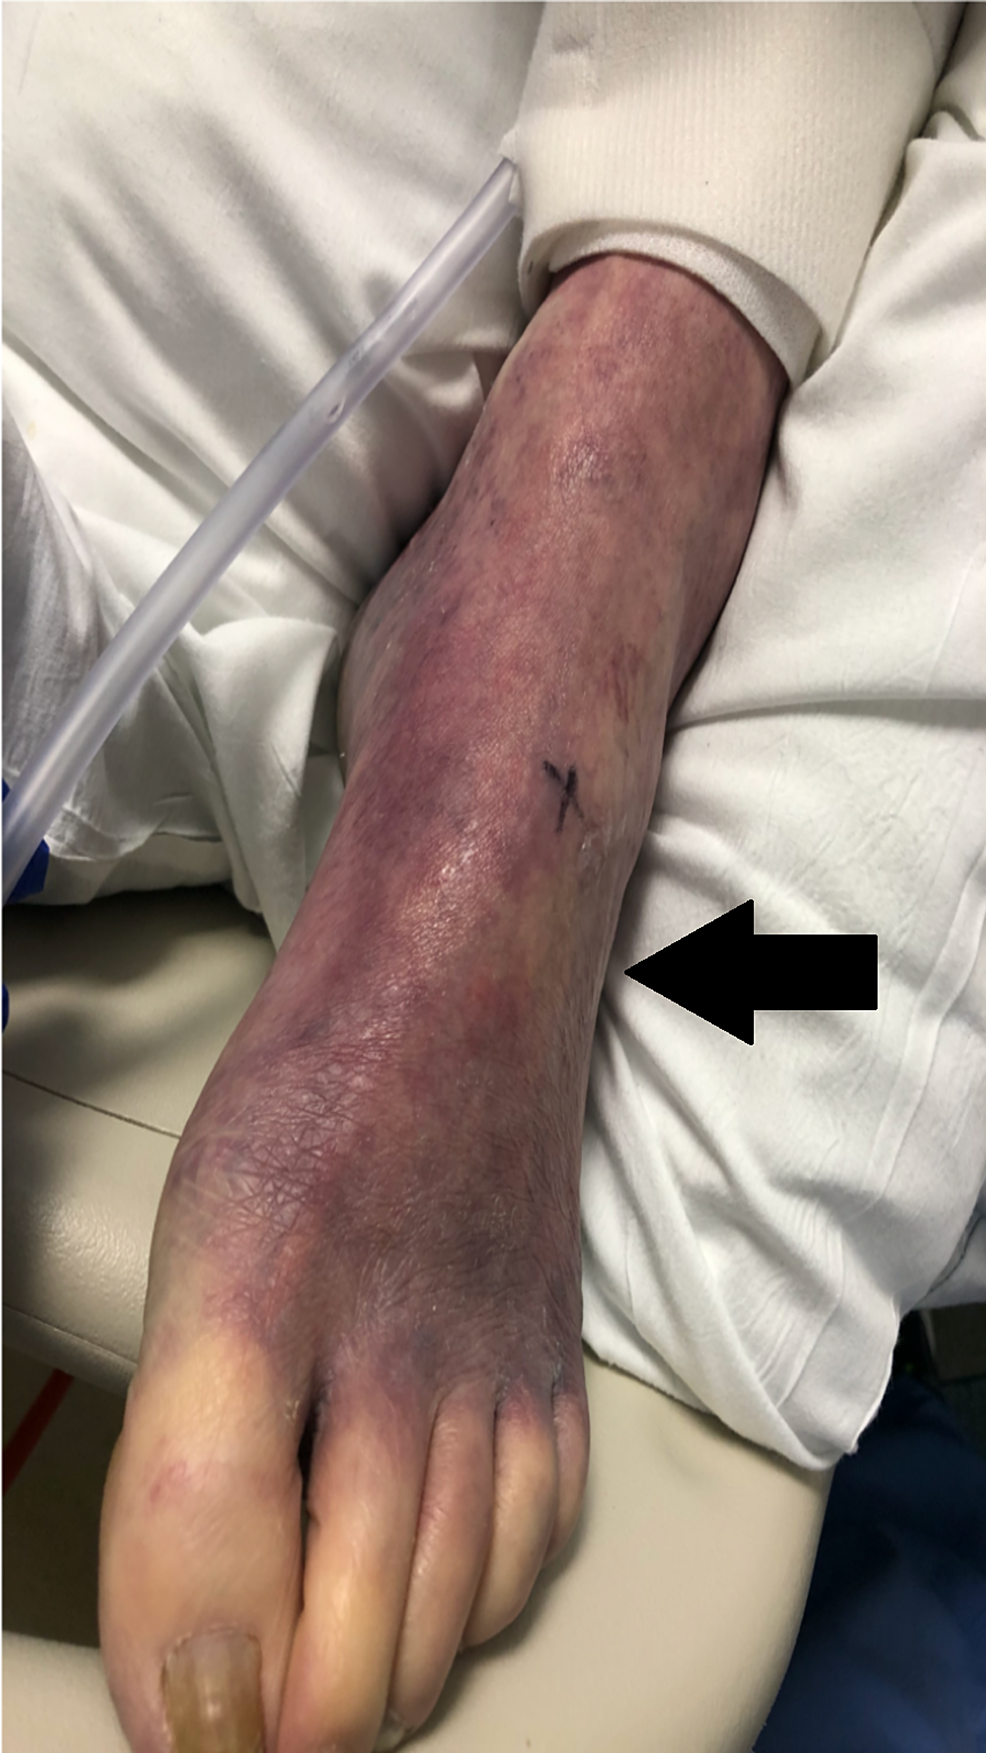 Peripheral-cyanosis---Ischemic-leg